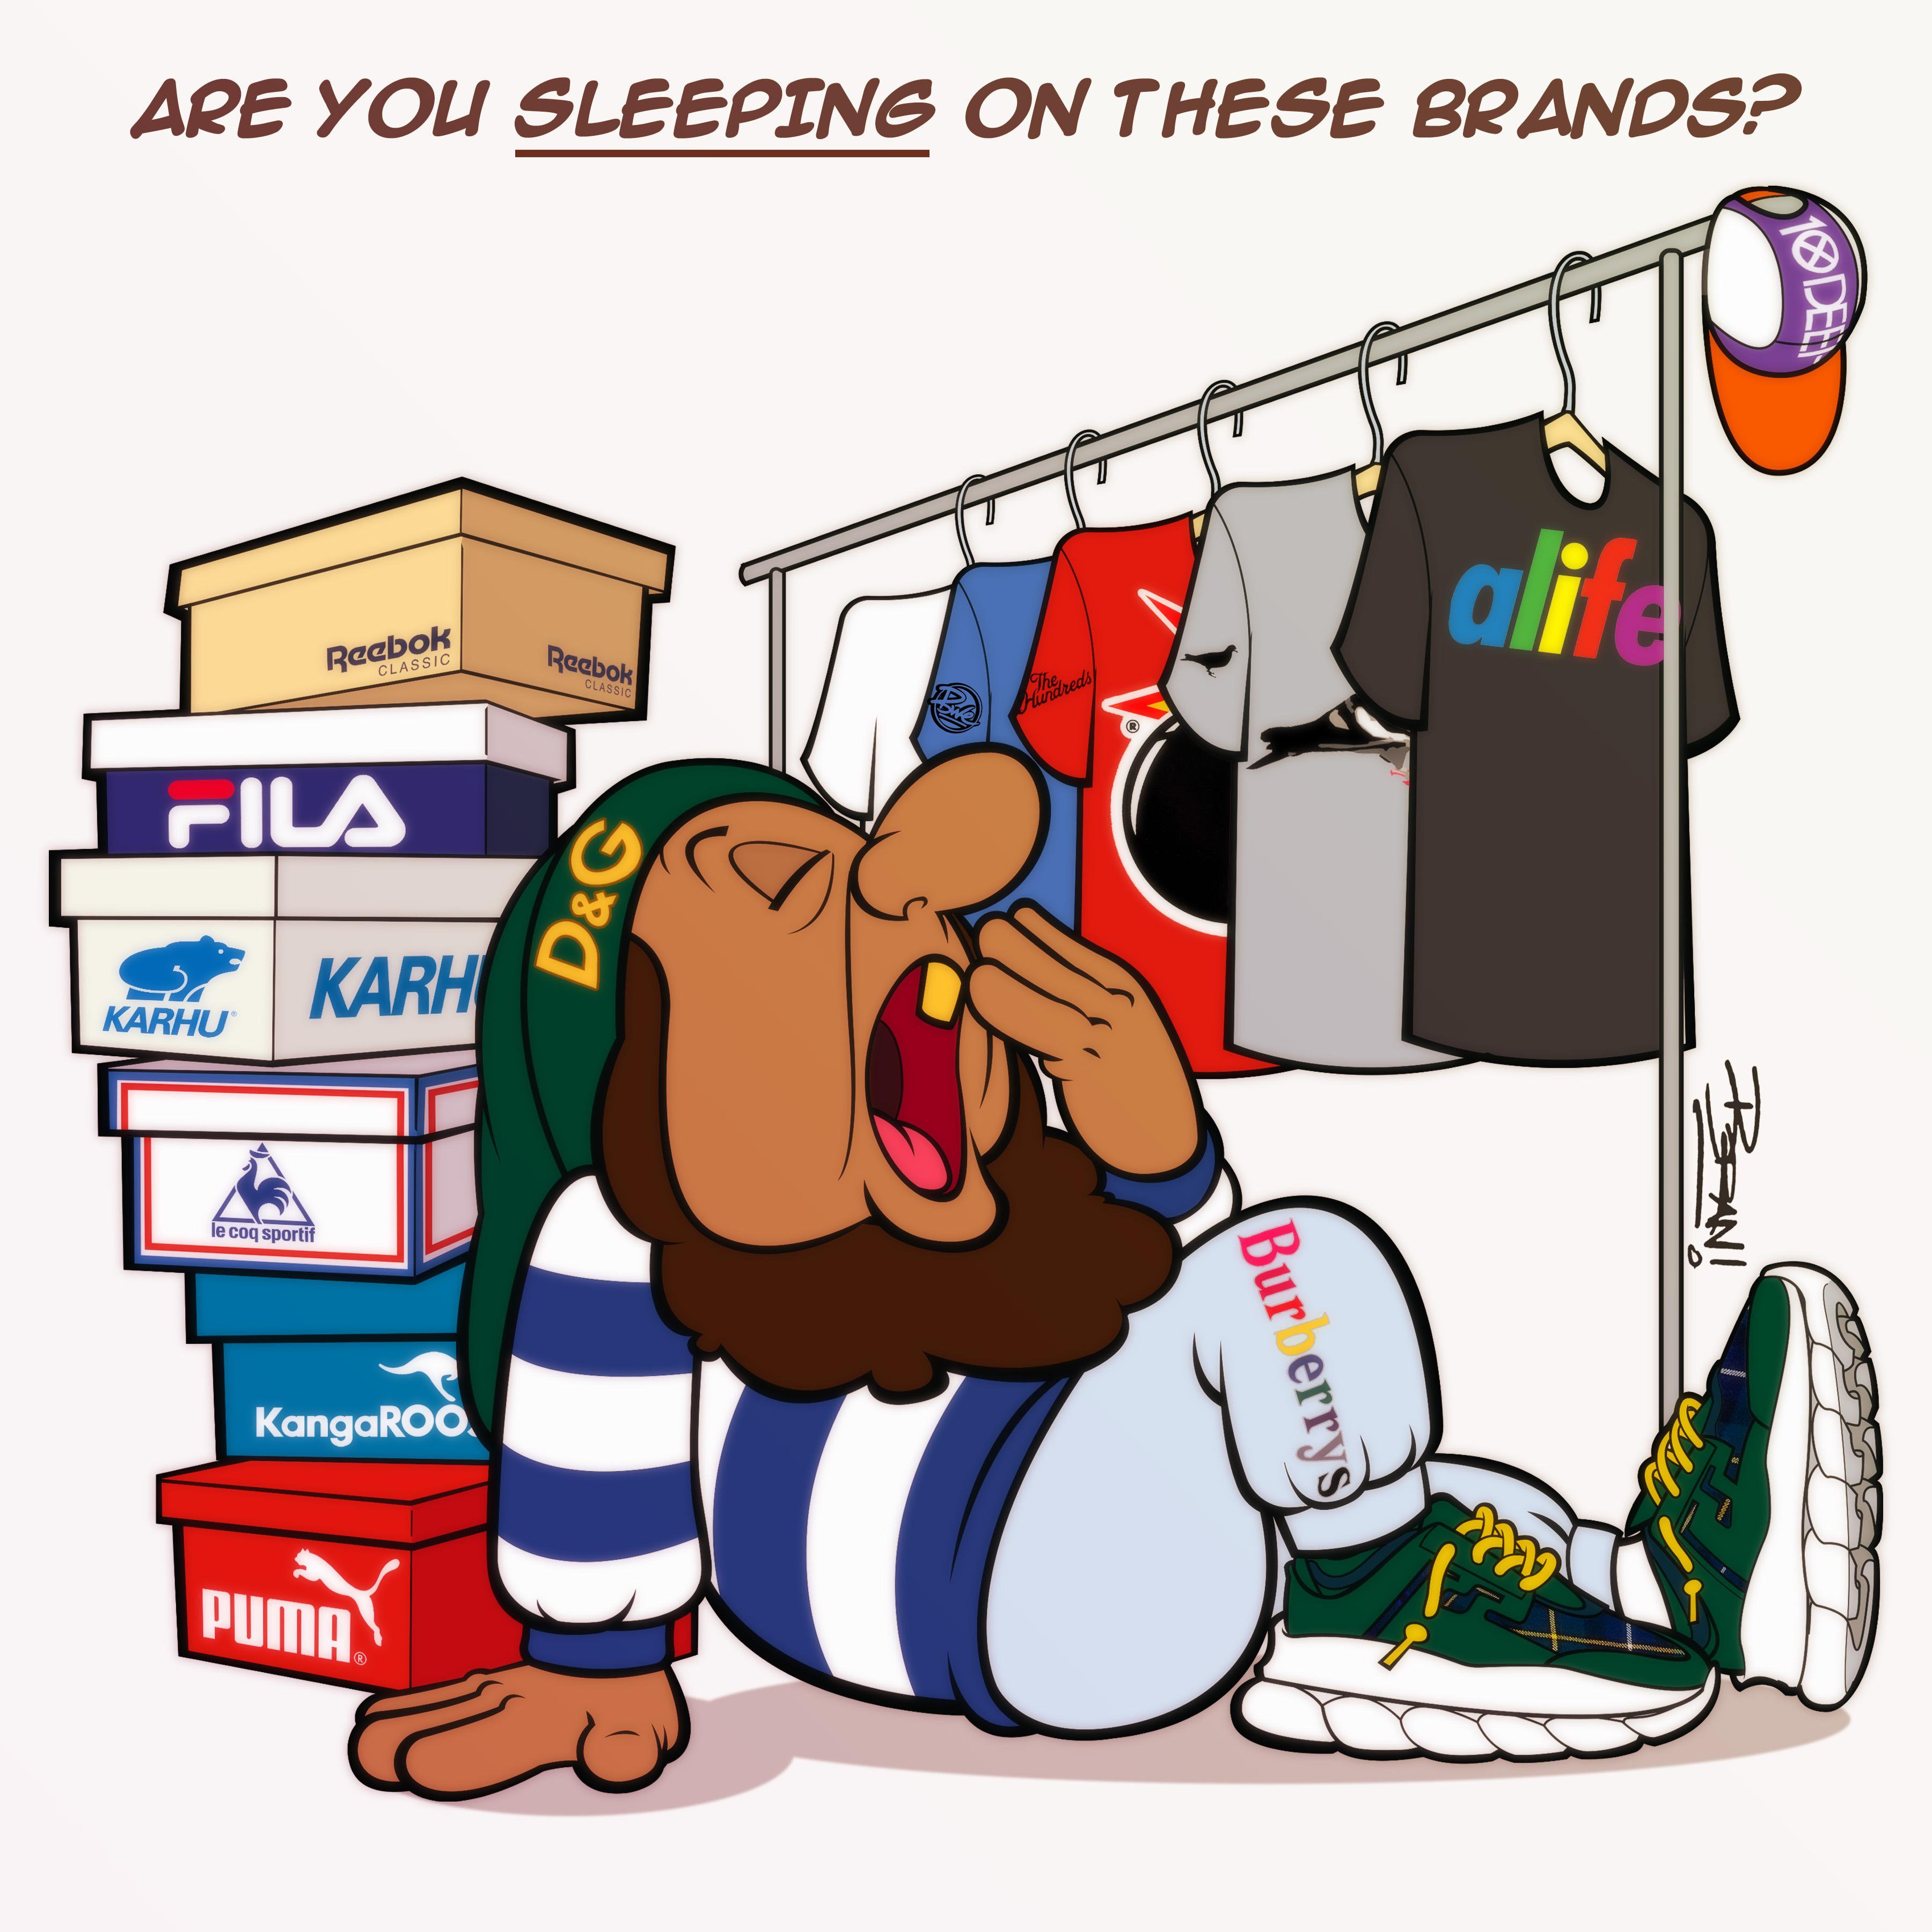 Brand Sleepin'